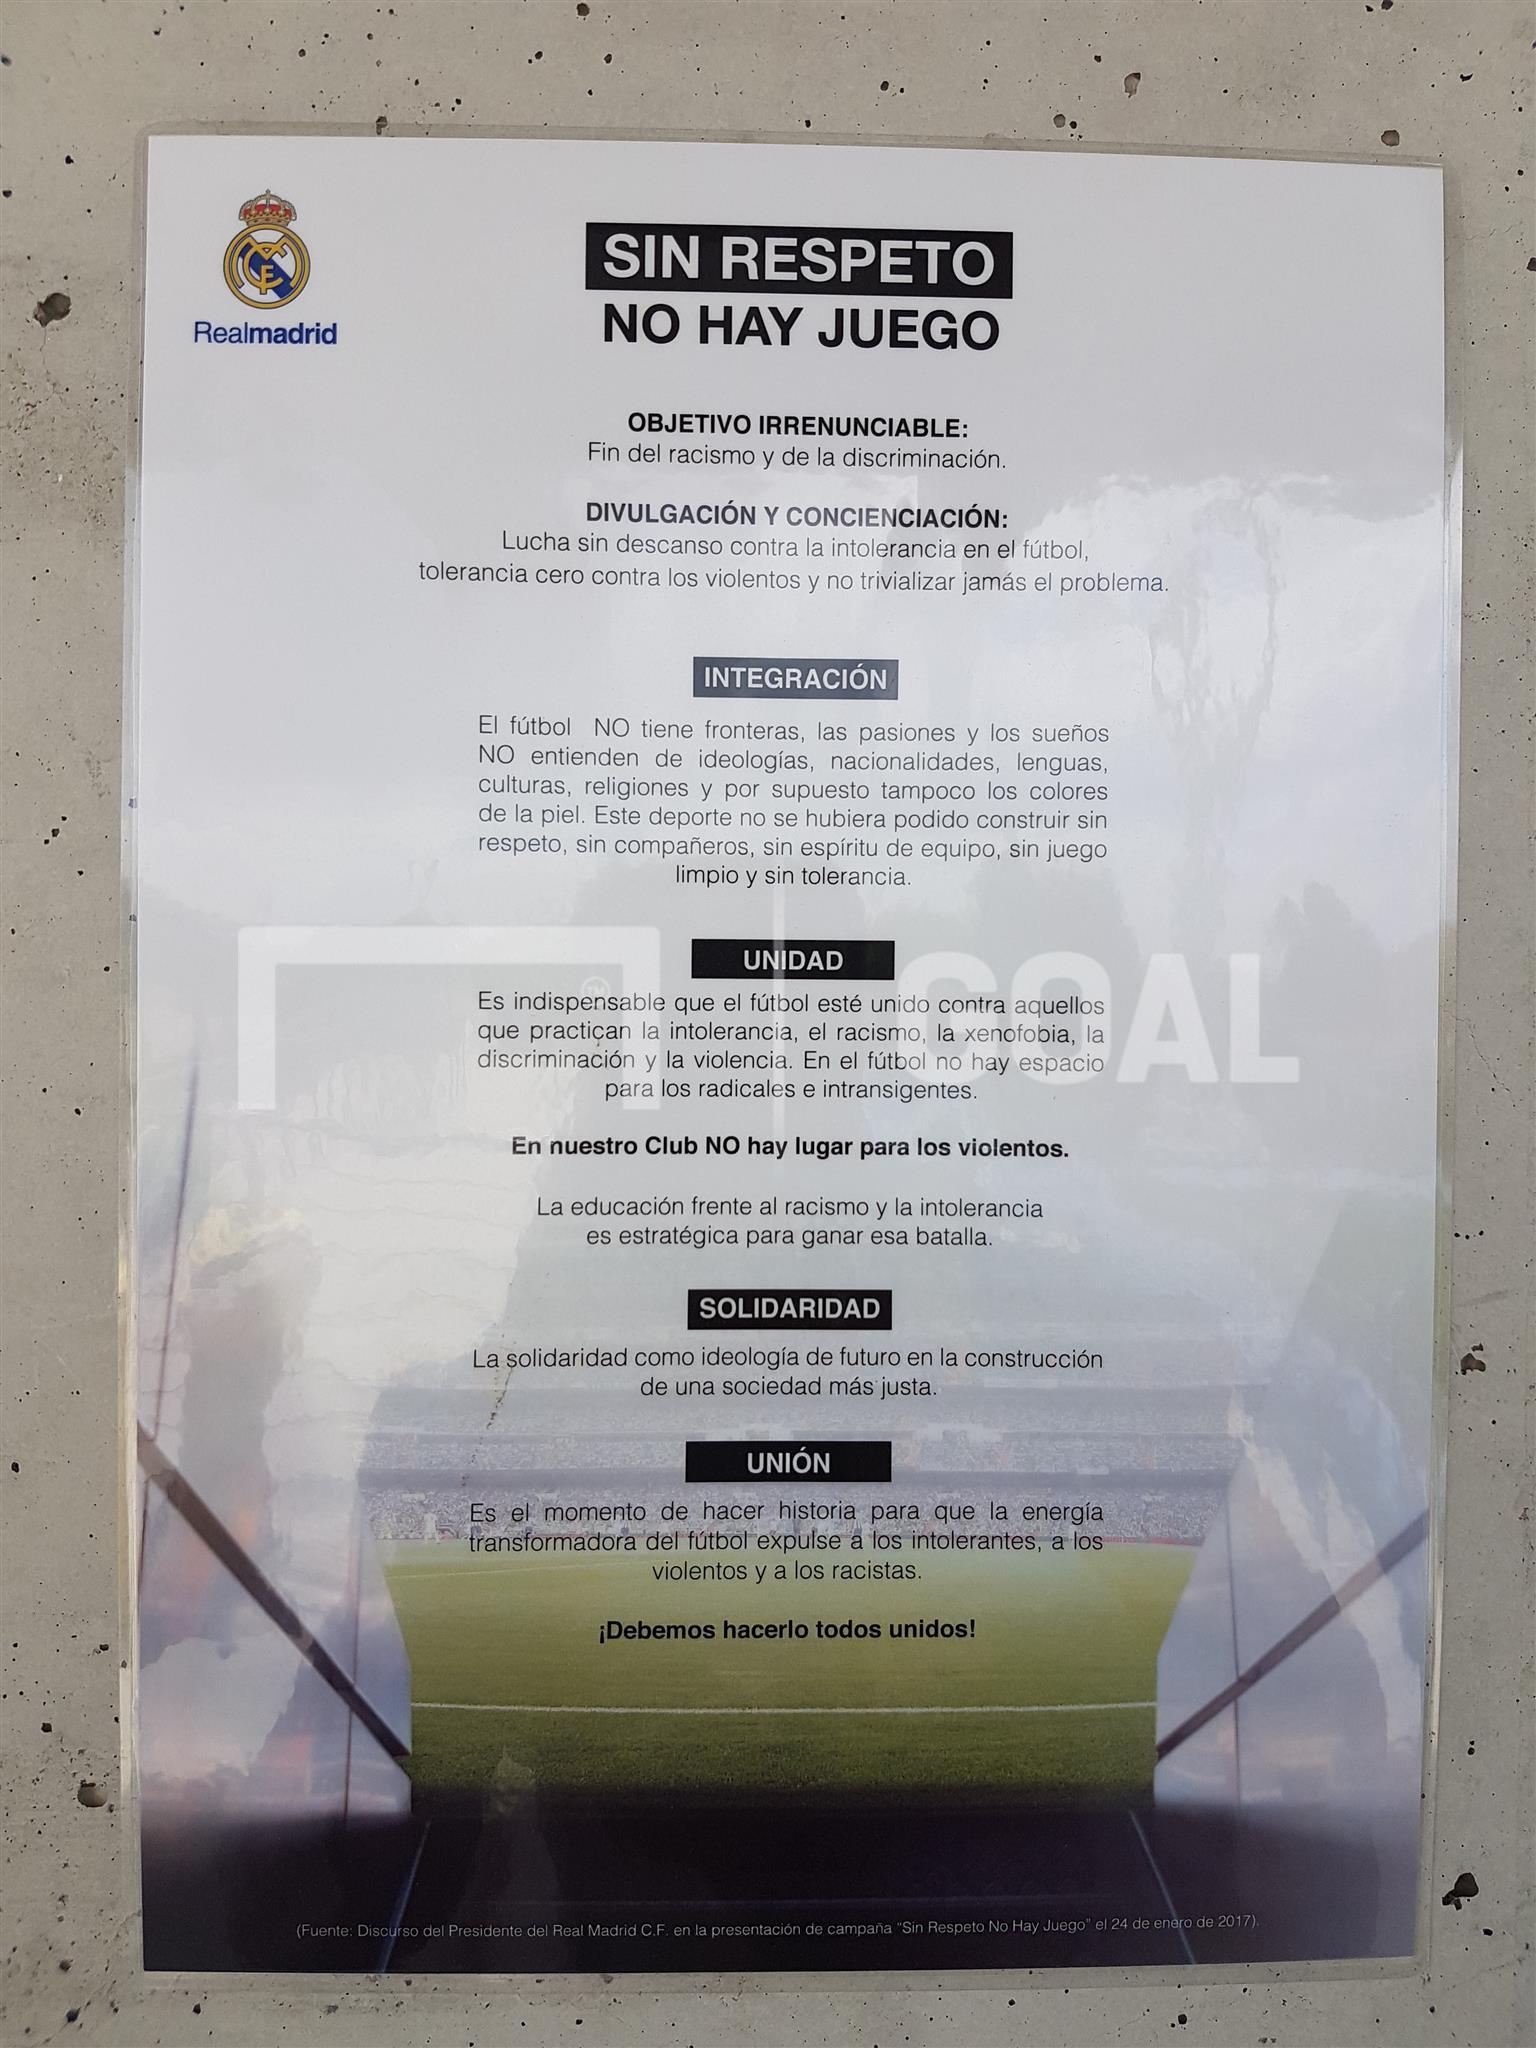 BODY ONLY - Real Madrid poster in Valdebebas: